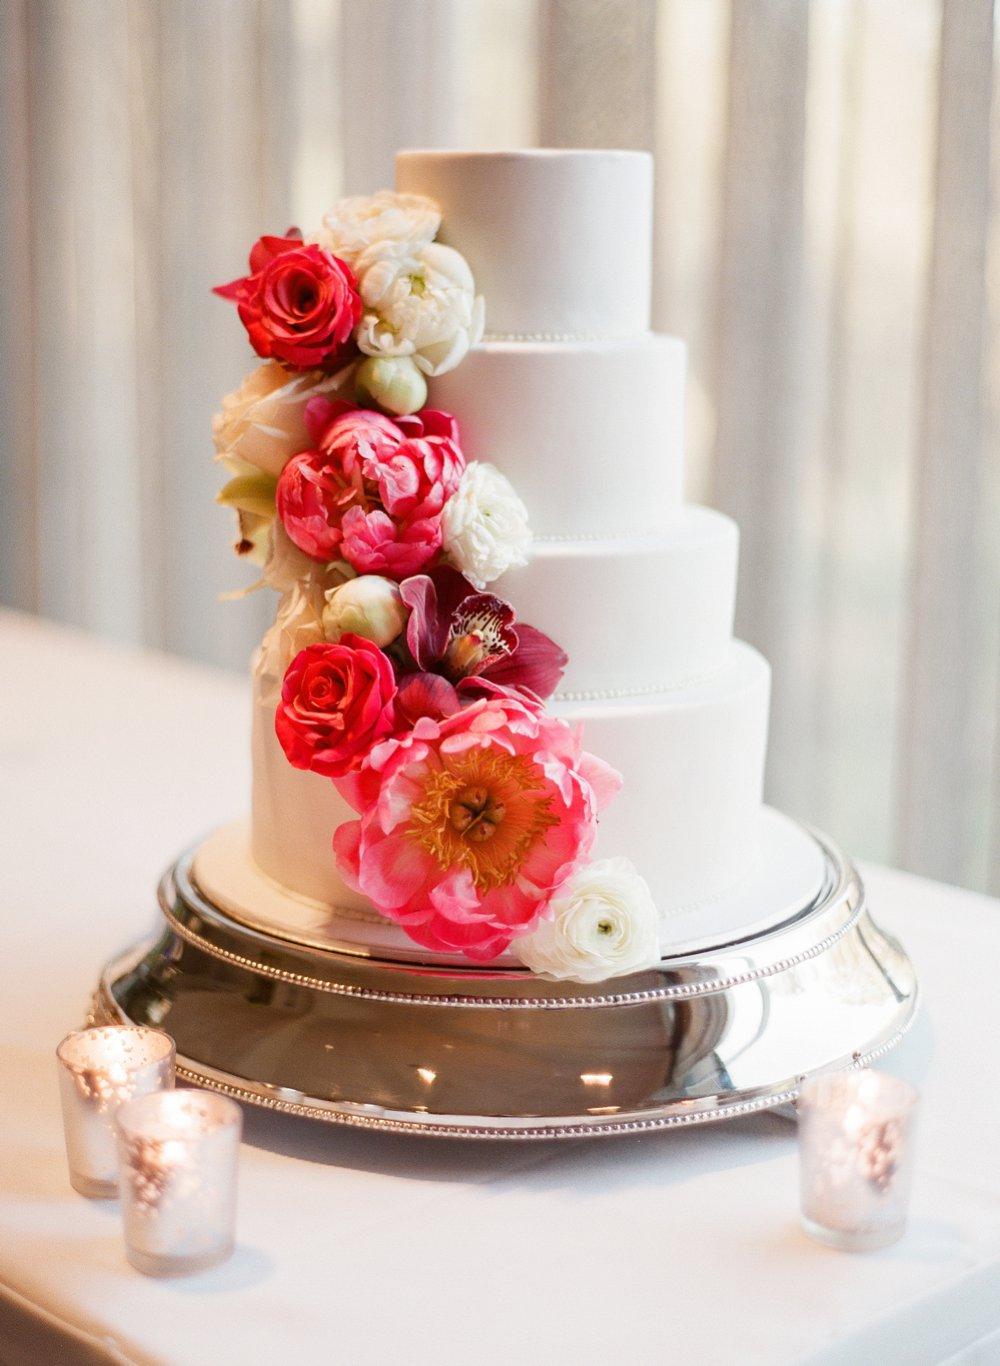 12 de la rosa cakes